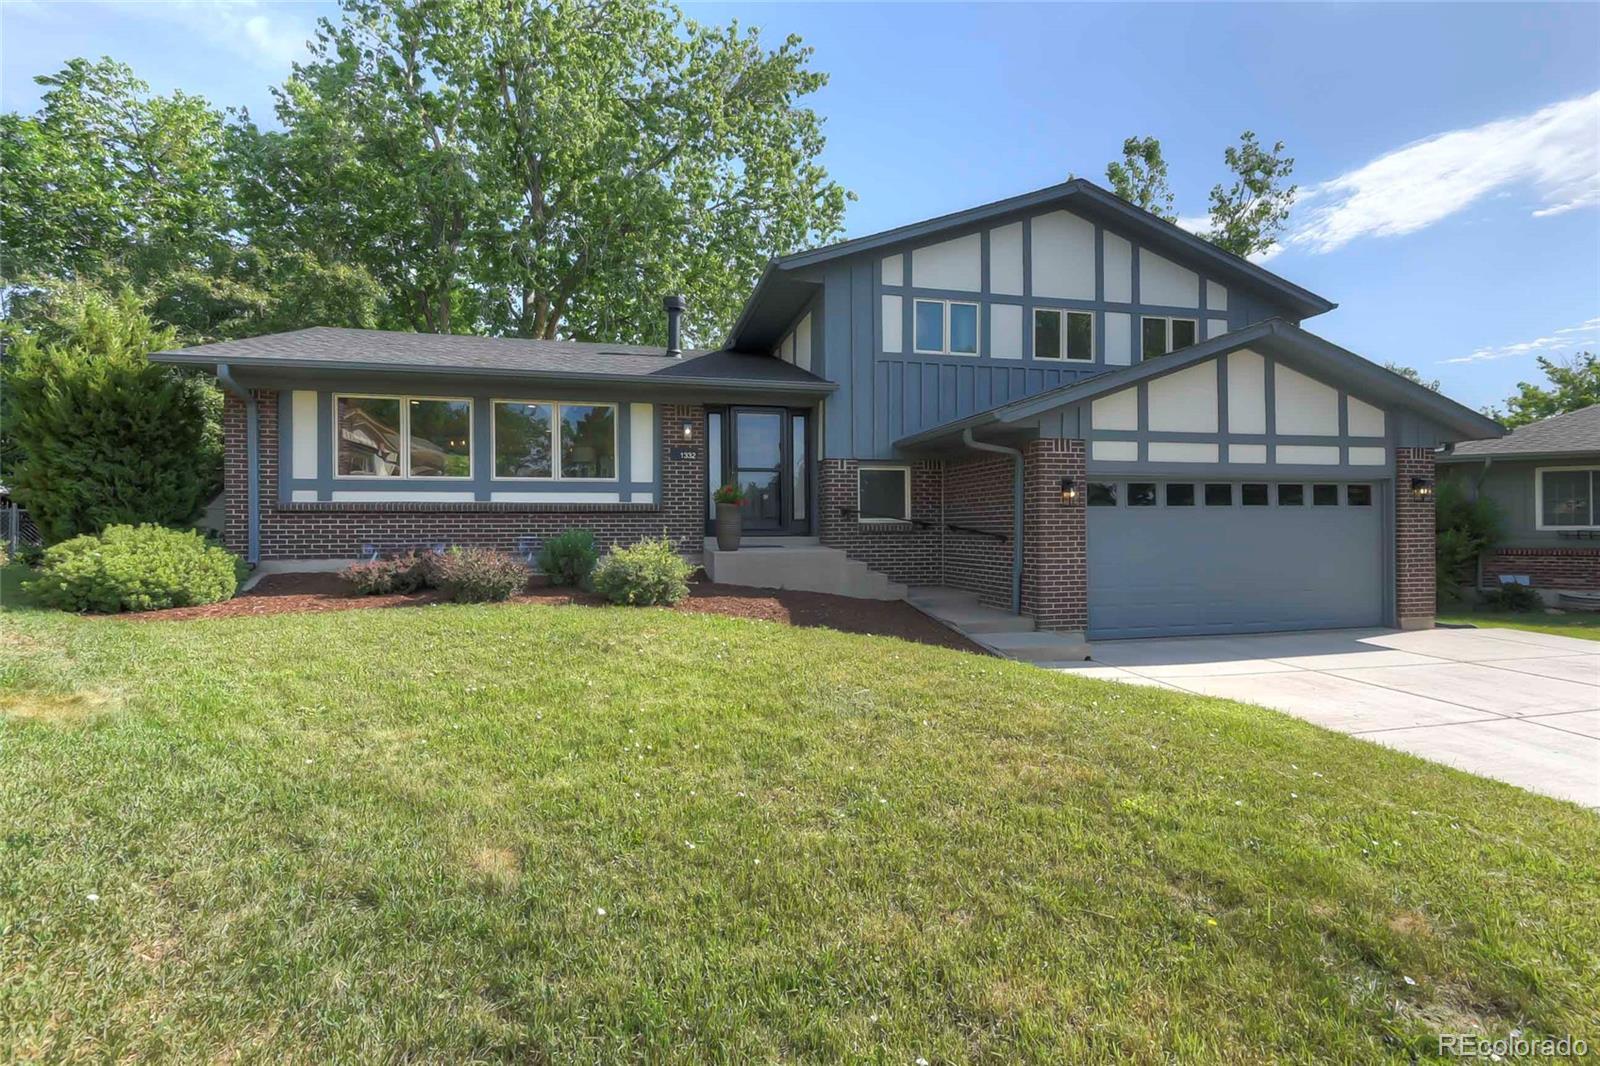 1332 S Yank Street Property Photo - Lakewood, CO real estate listing